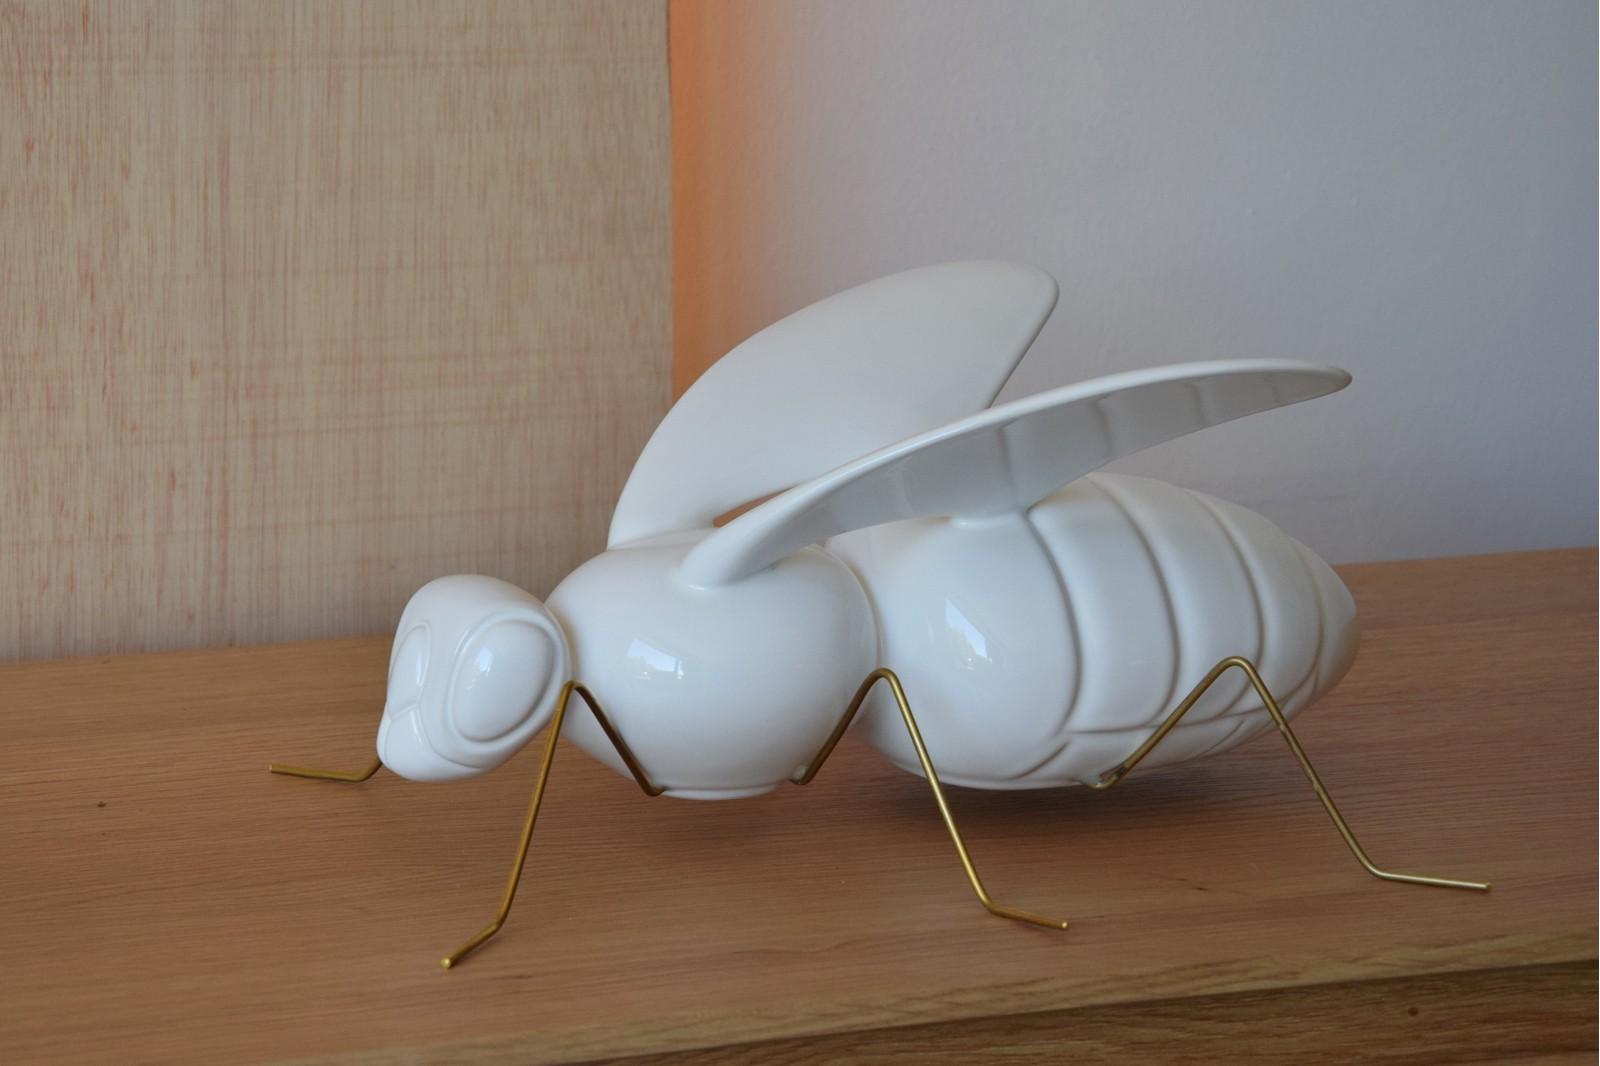 BEE SCULPTURE. CERAMIC. GLOSSY WHITE